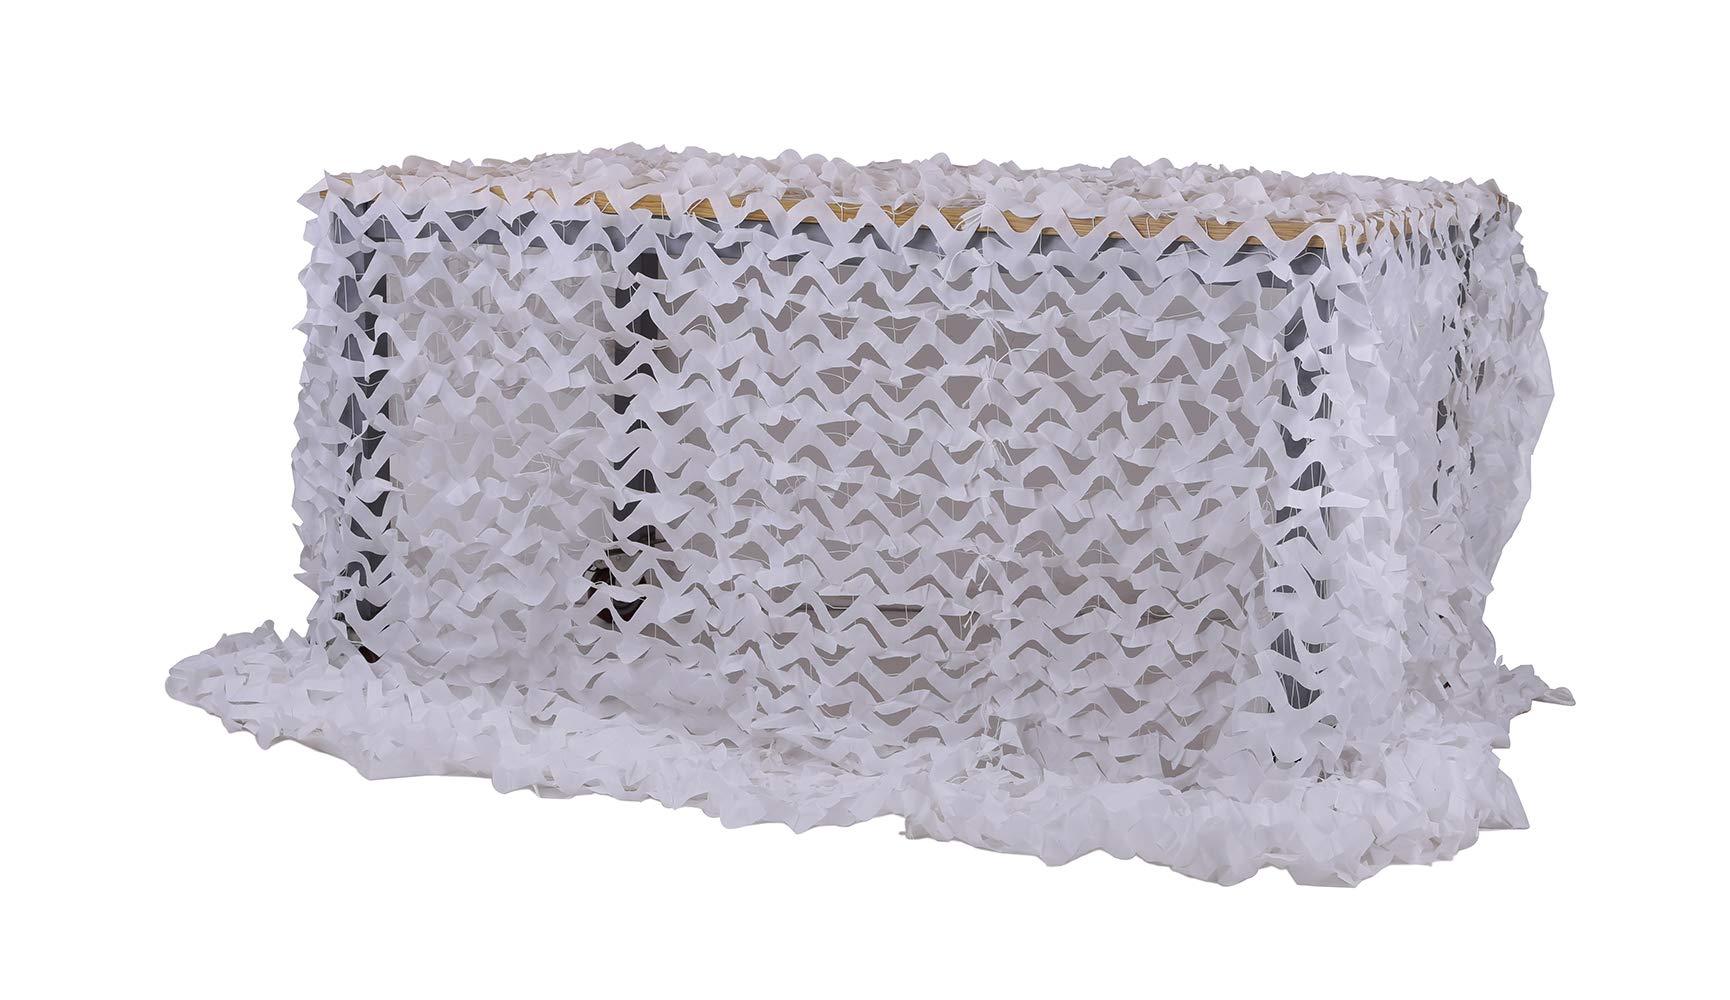 Chiglia Camouflage Netting Camo Net Sunscreen Nets Wihte 13ftx16ft